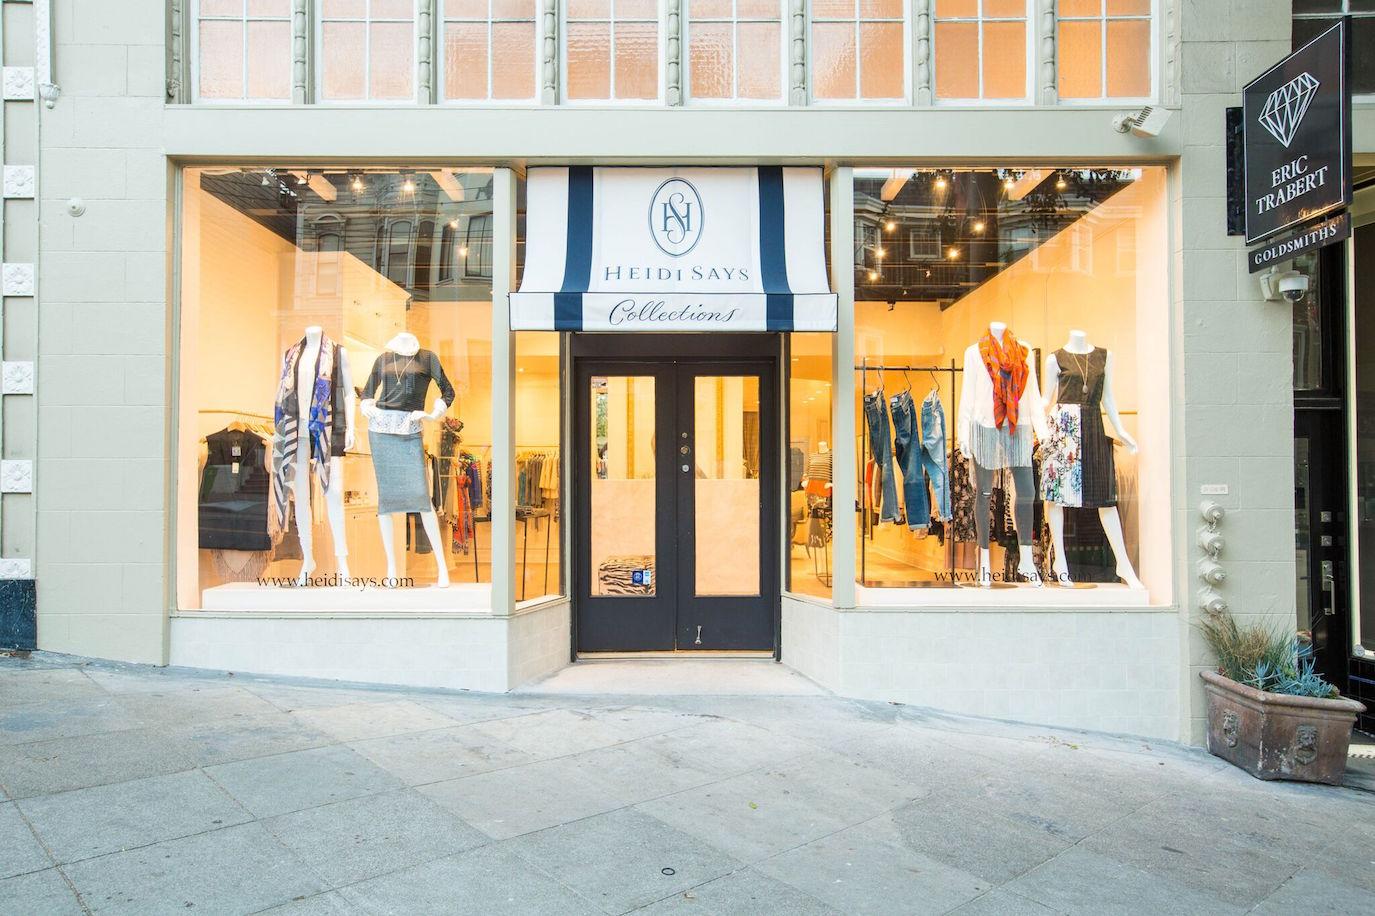 HeidiSay's store front on Fillmore Street